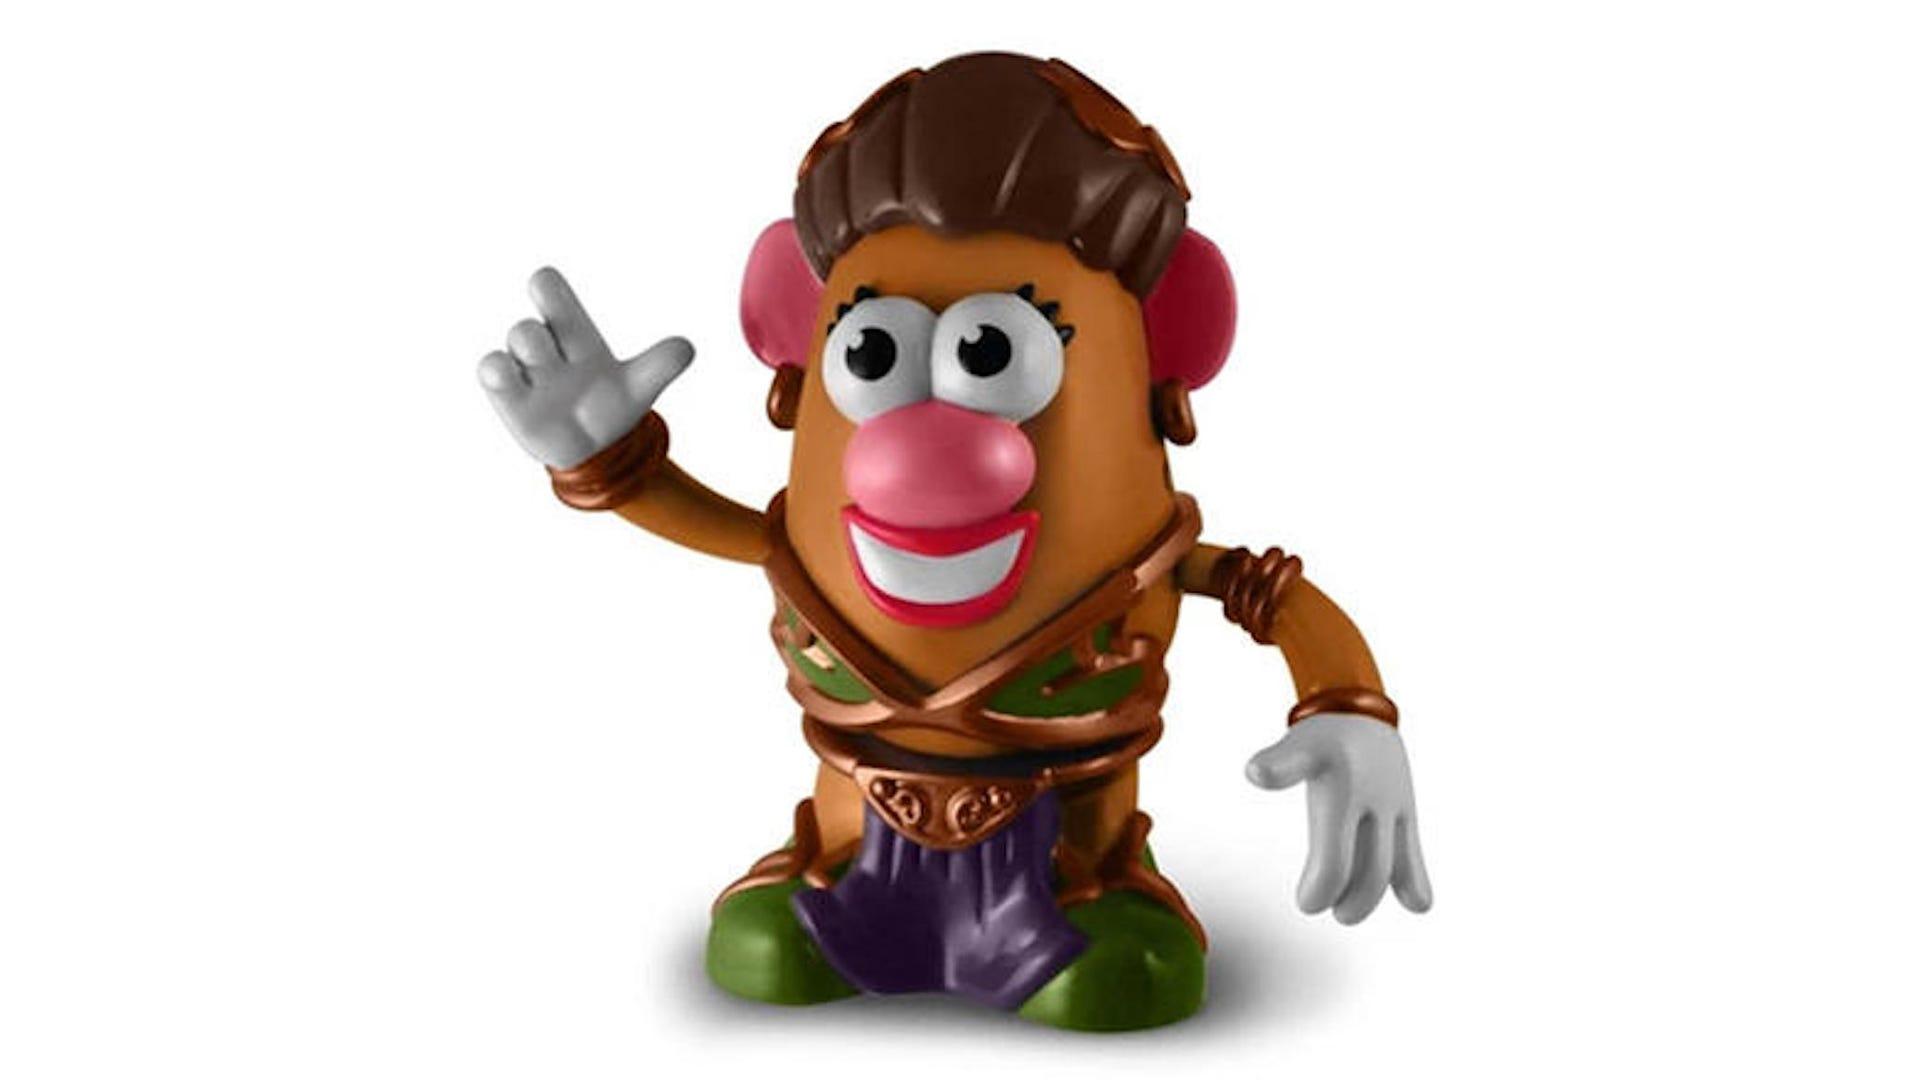 Princess Leia Mrs. Potato Head